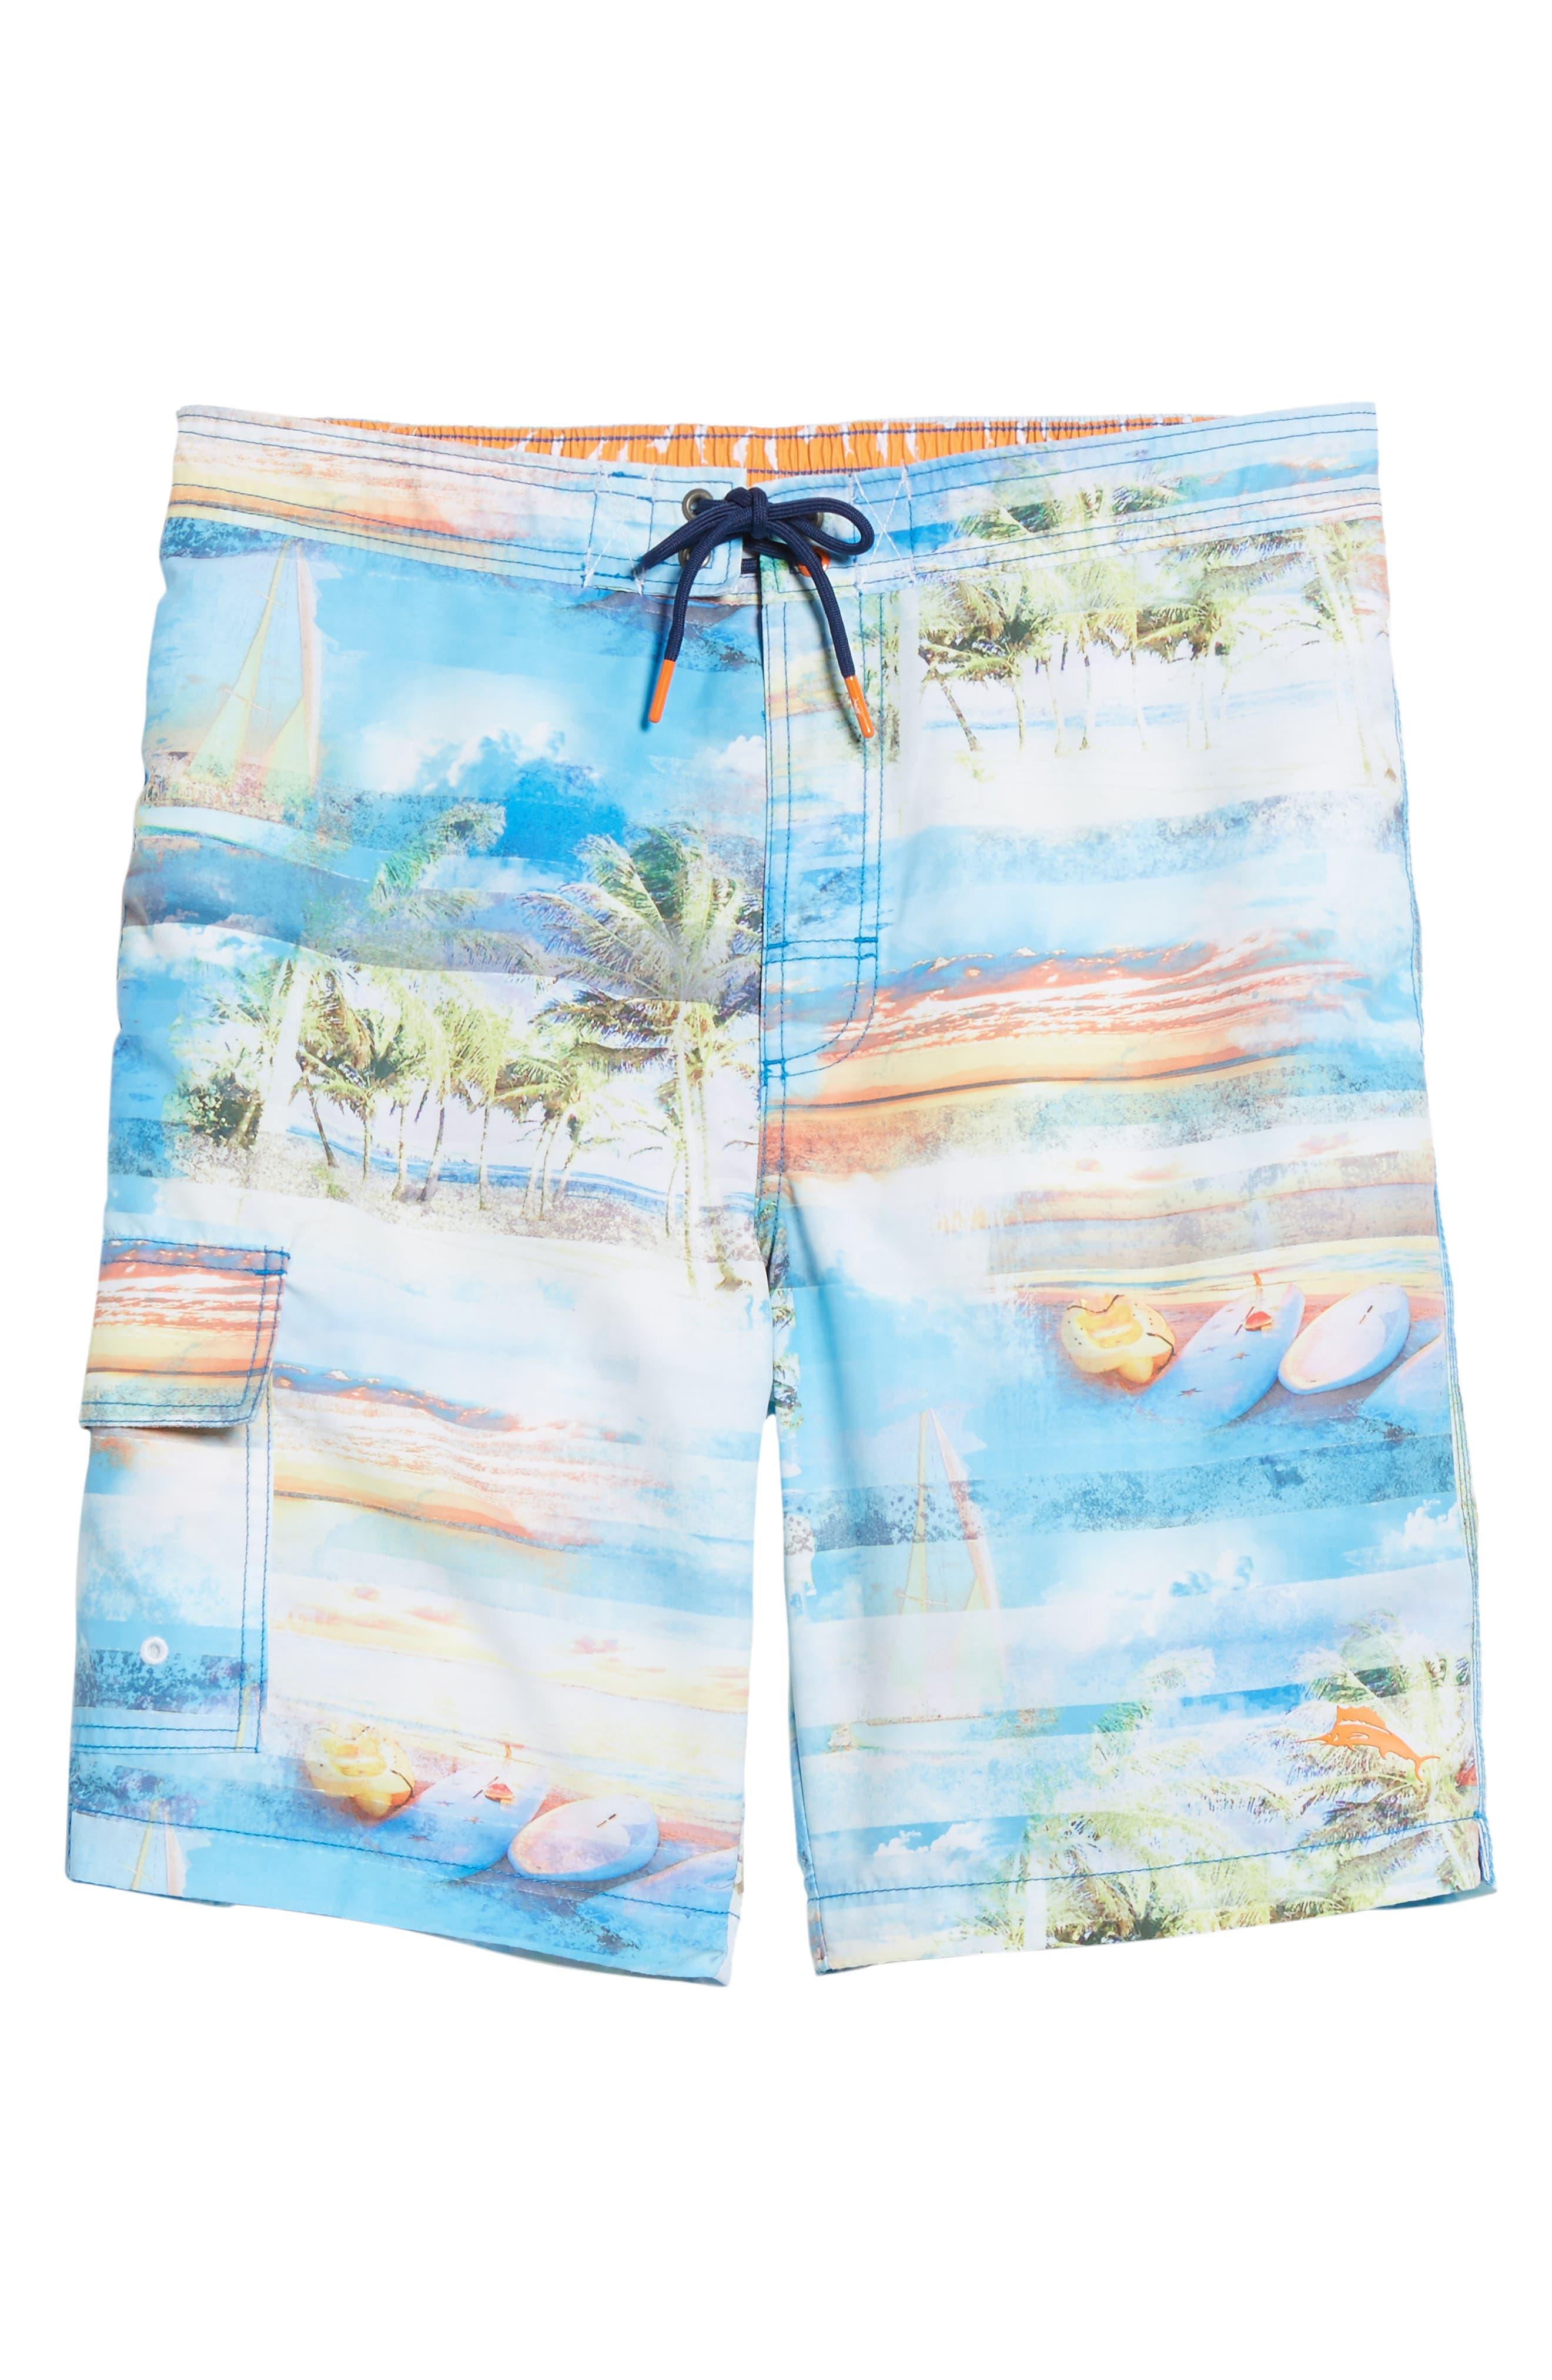 Baja Electric Beach Swim Trunks,                             Alternate thumbnail 6, color,                             400